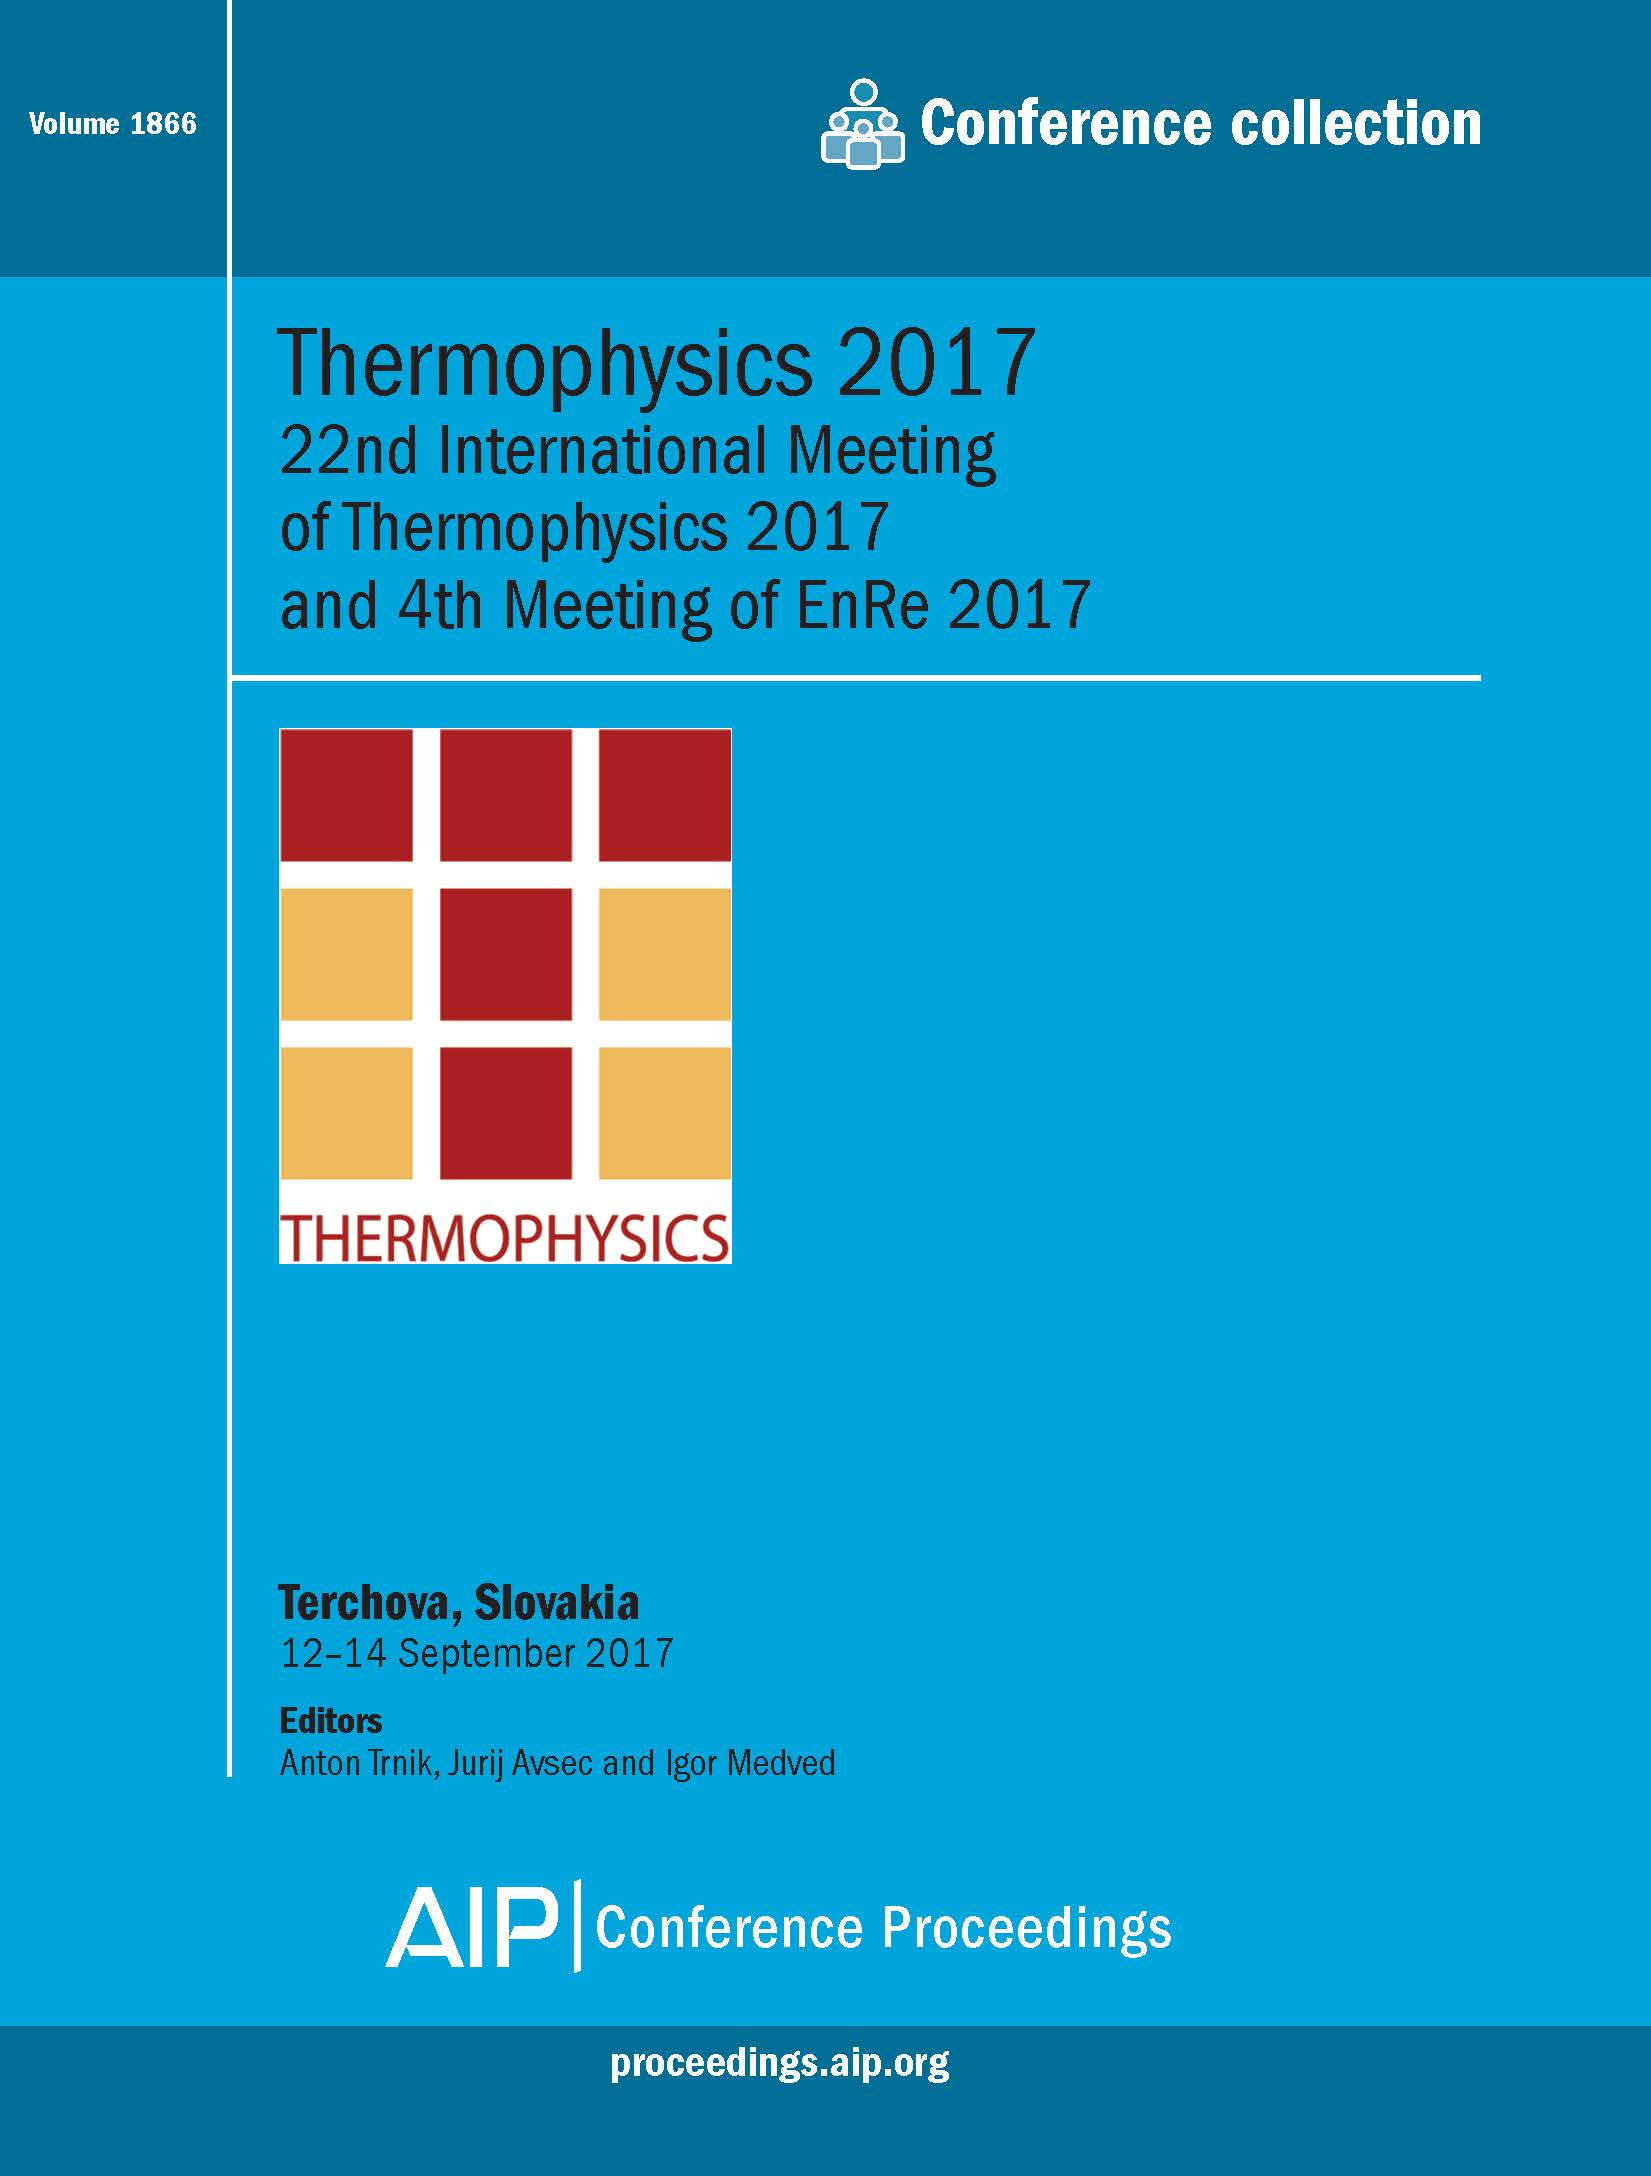 Volume 1866: Thermophysics 2017 | AIP Publishing Print on Demand